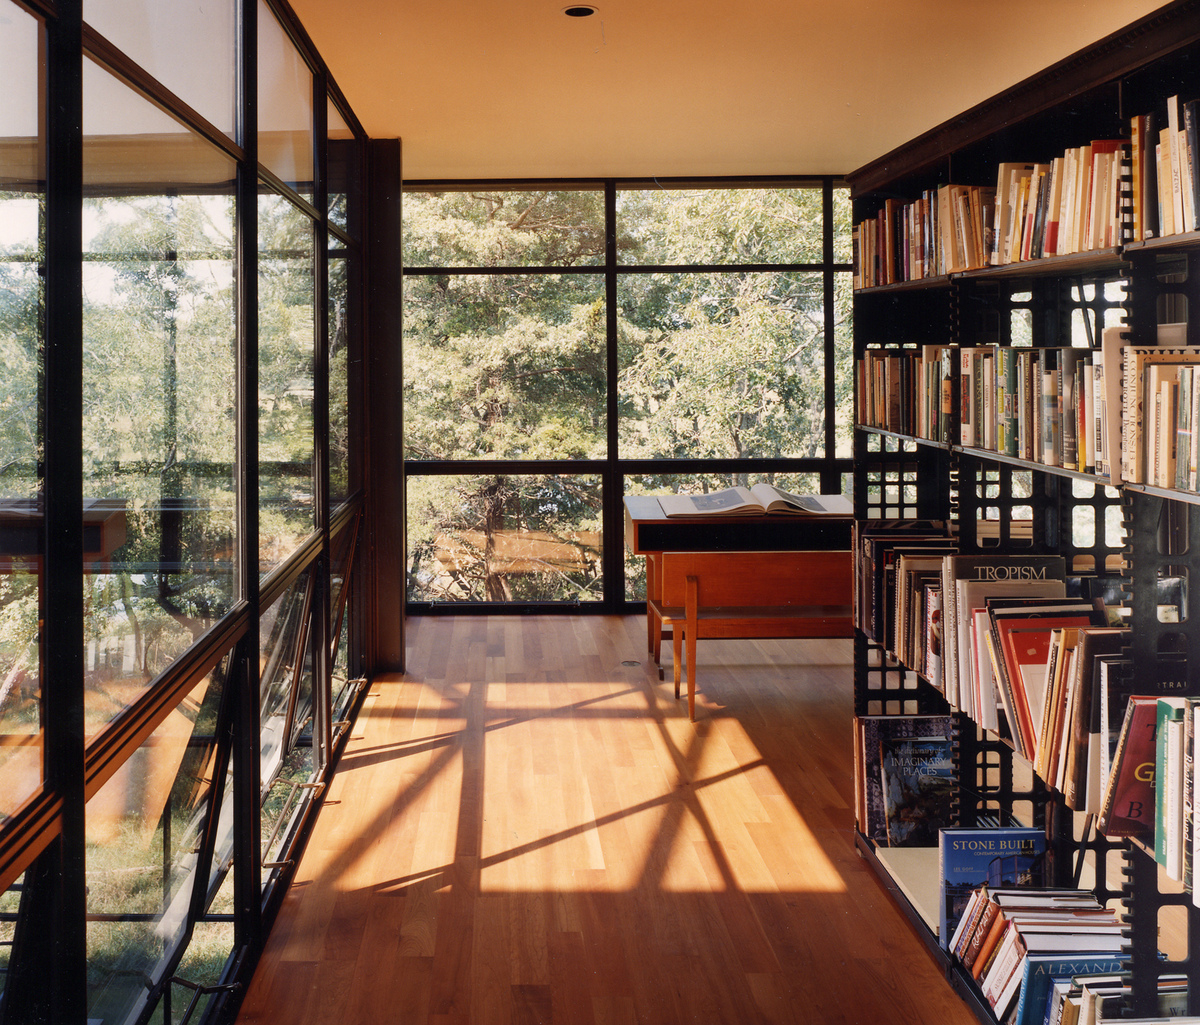 Lee H. Skolnick Architecture